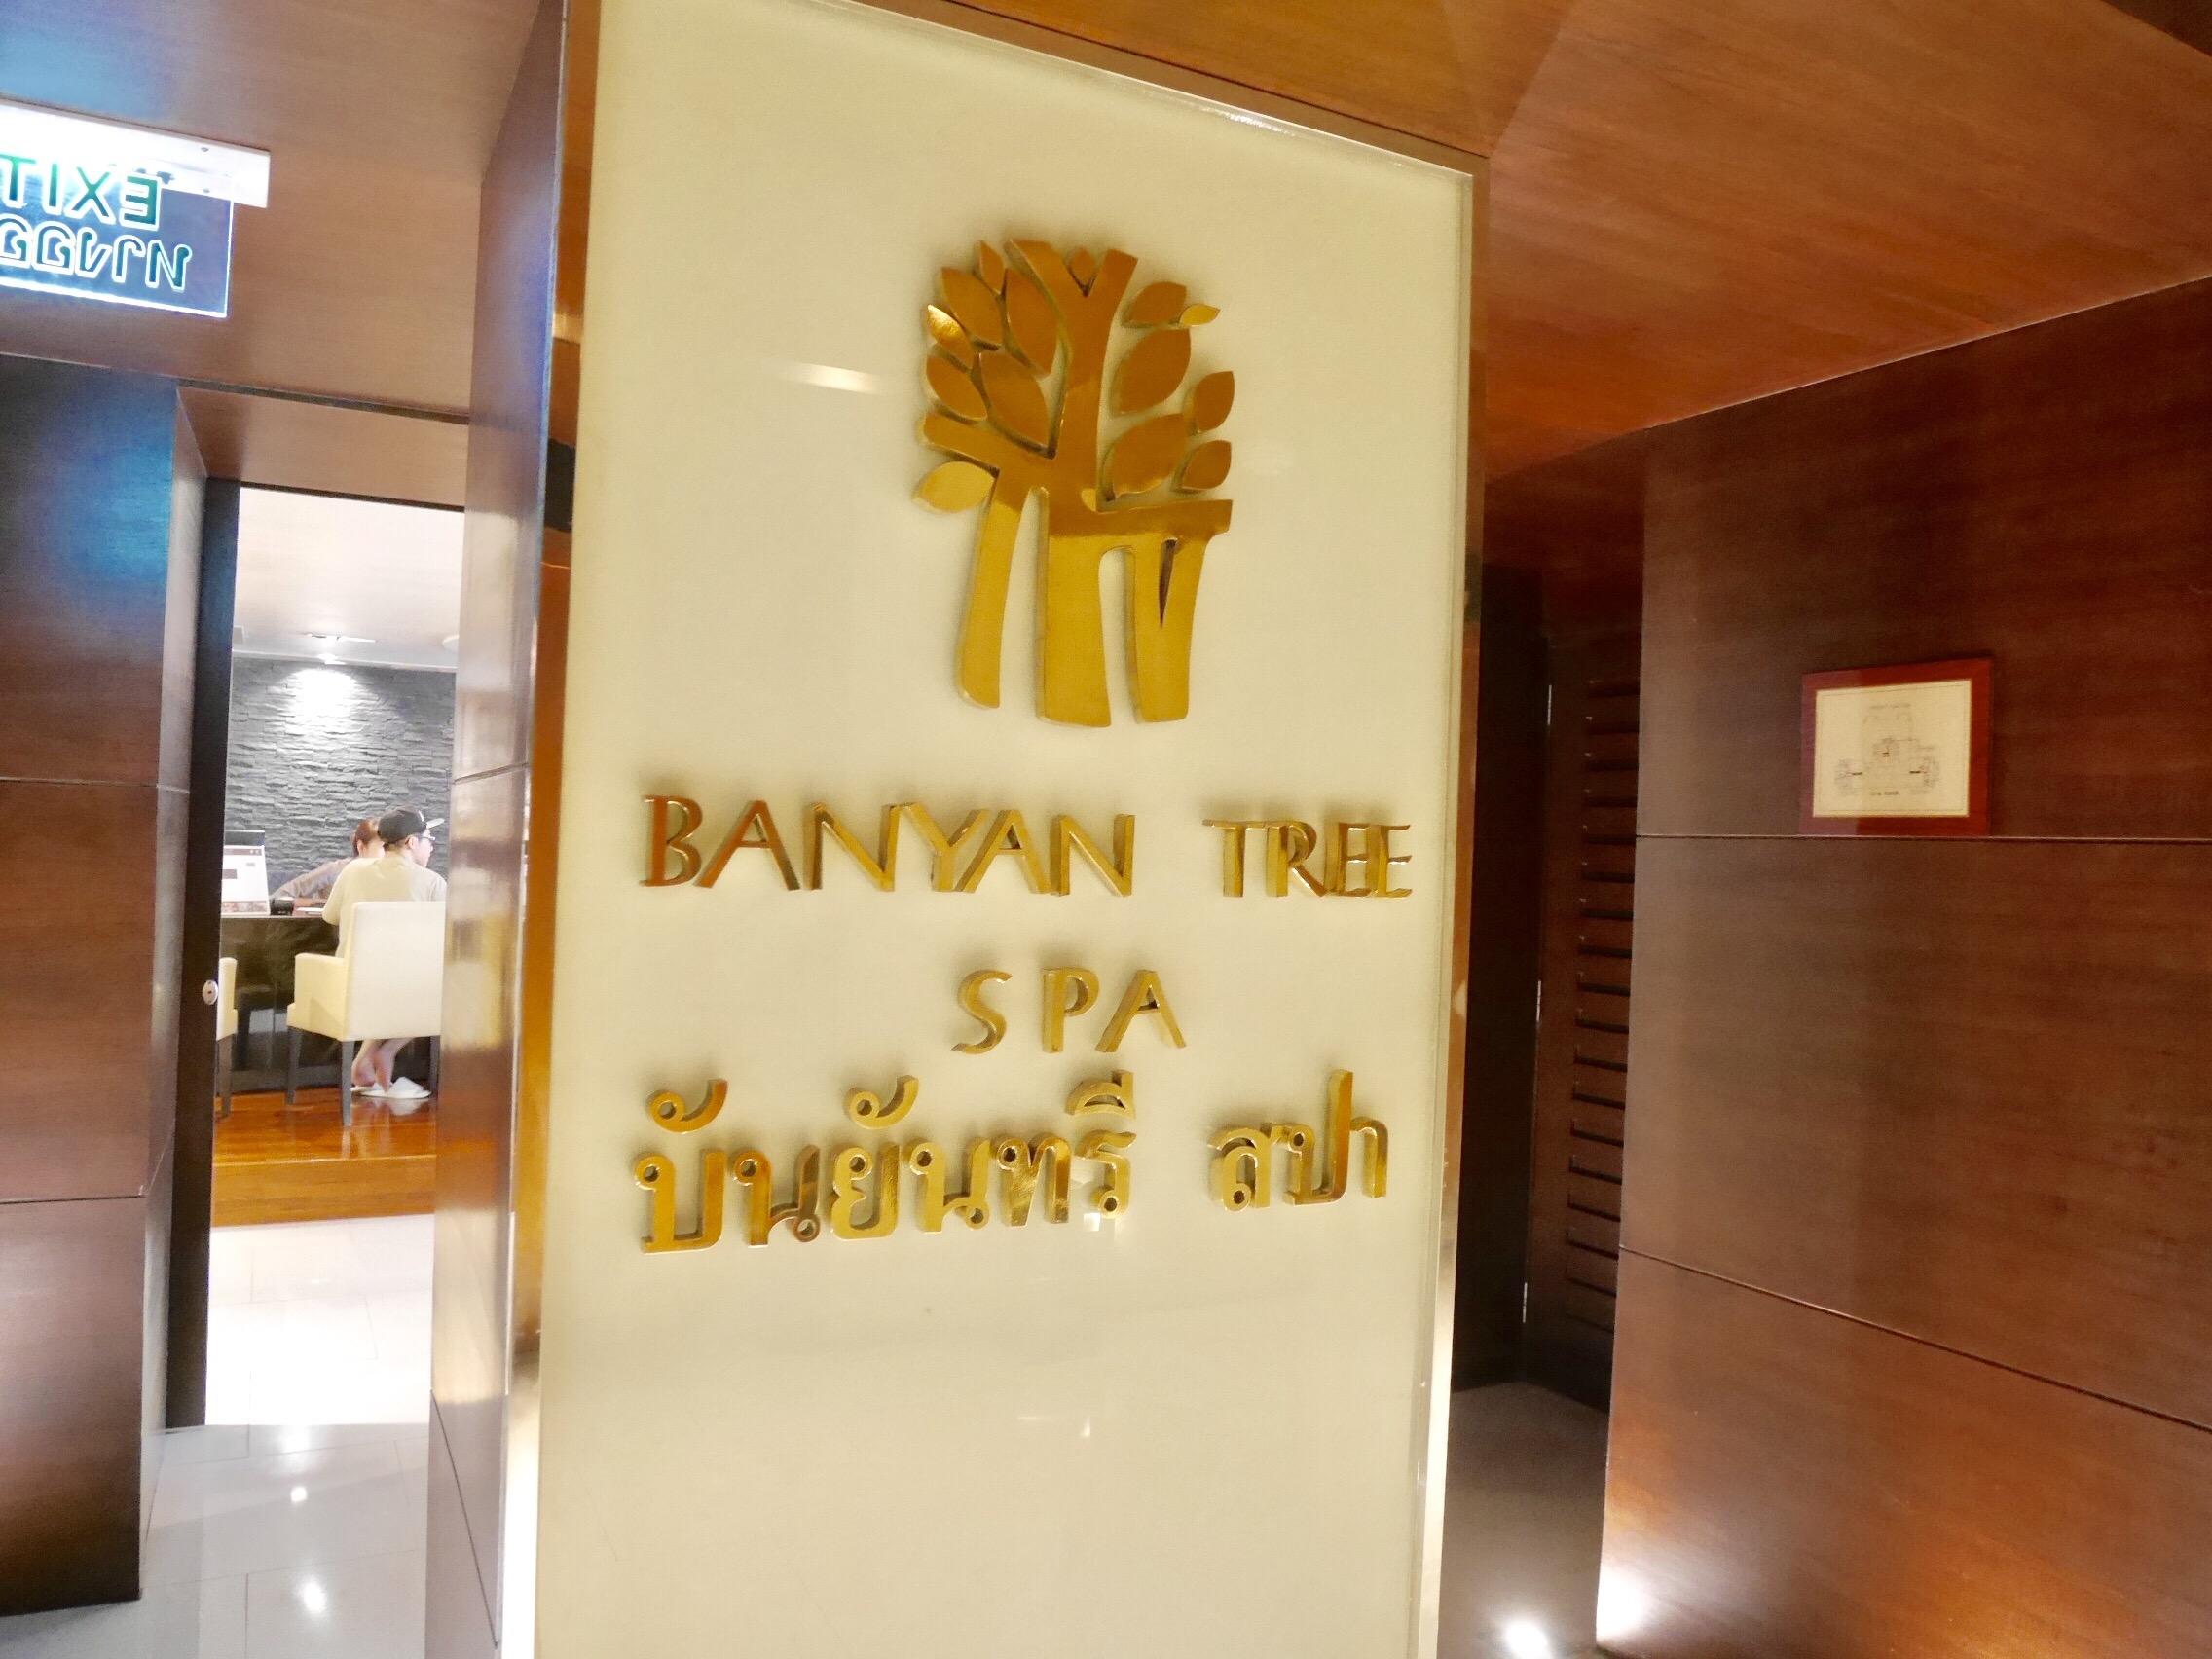 img 8218 - Banyan Tree Spa Bangkok -  都会の喧騒を逃れて楽しむ極上スパ体験